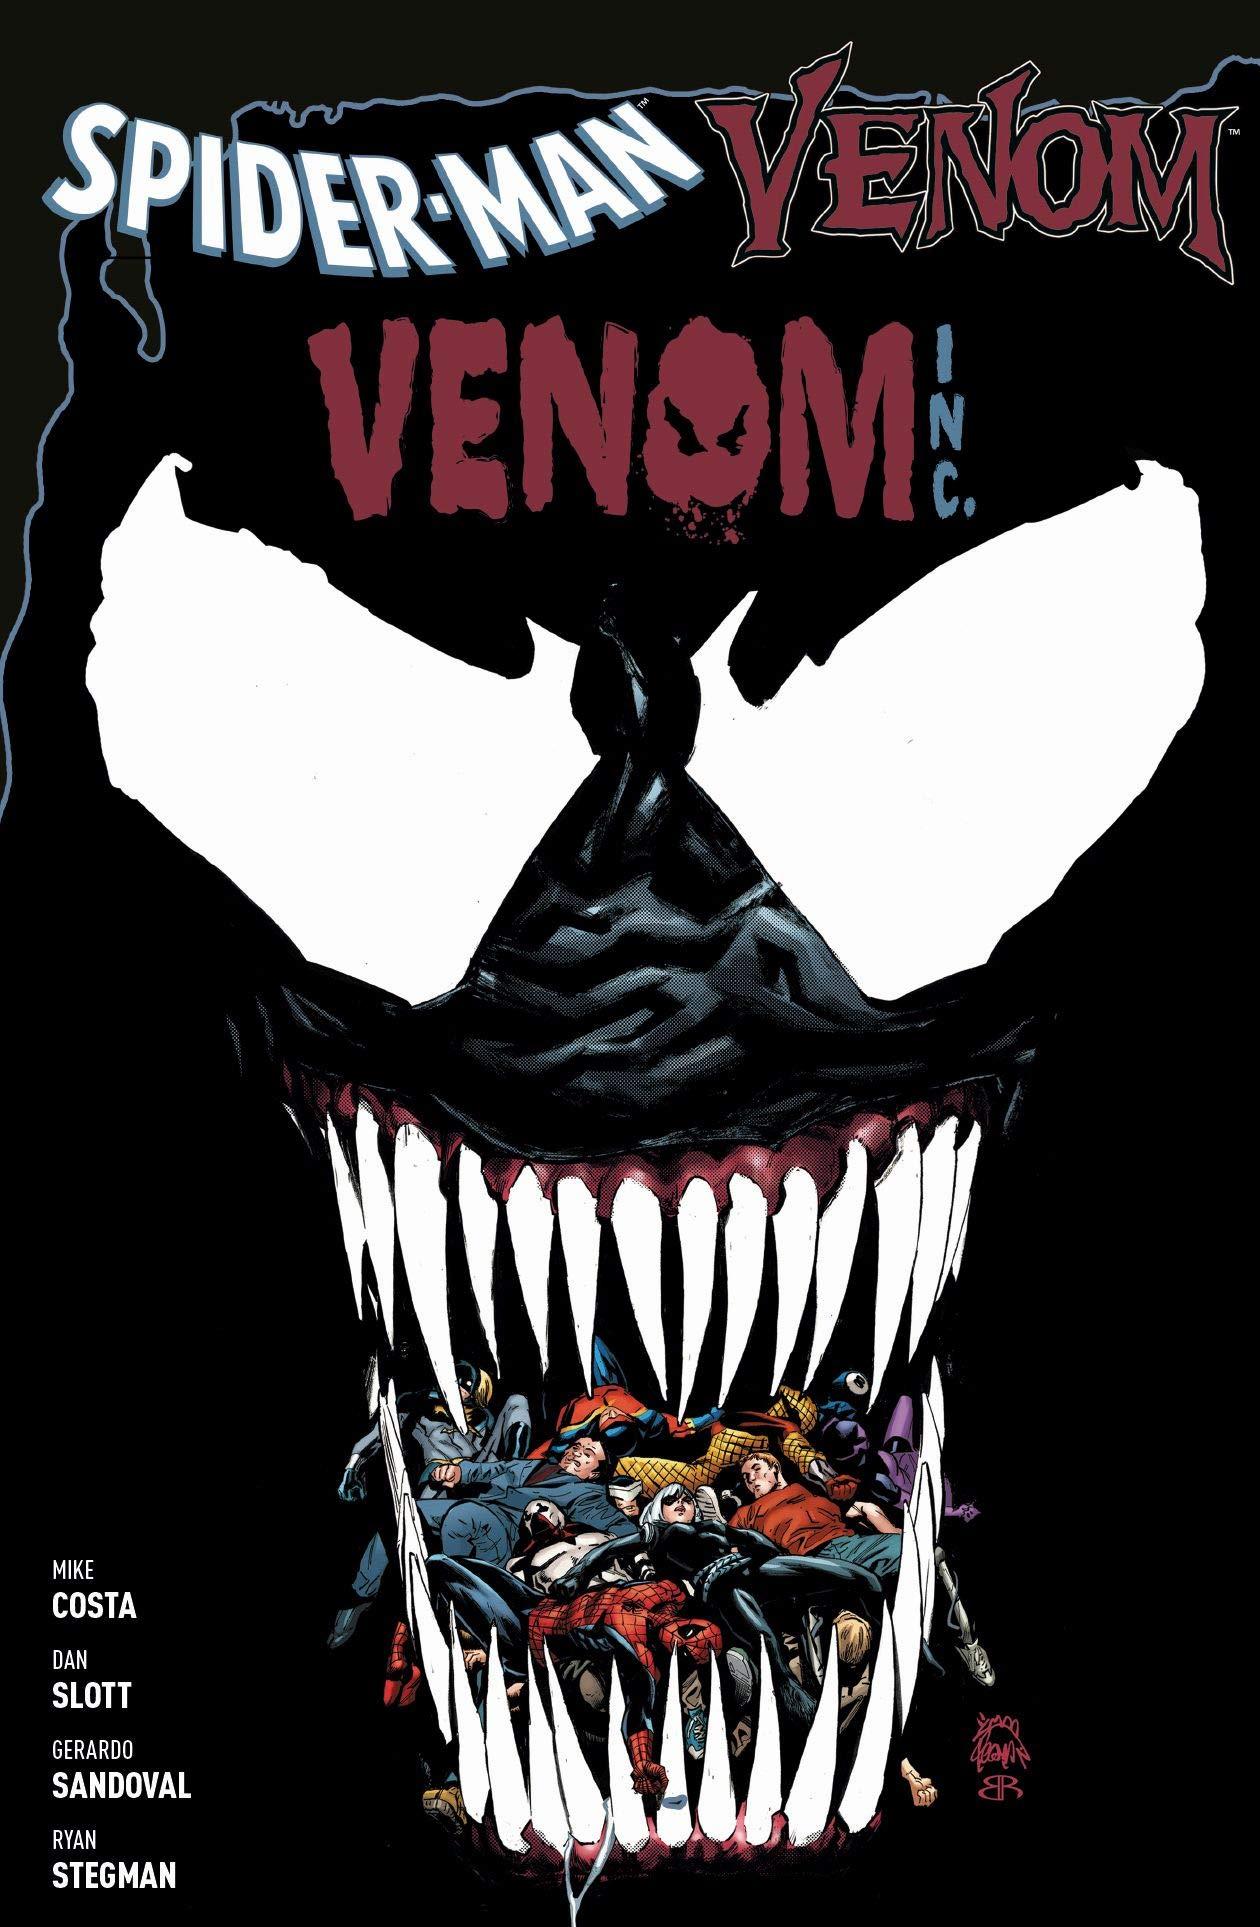 Spider-Man & Venom: Venom Inc. Taschenbuch – 11. September 2018 Dan Slott Ryan Stegman MIke Costa Gerardo Sandoval